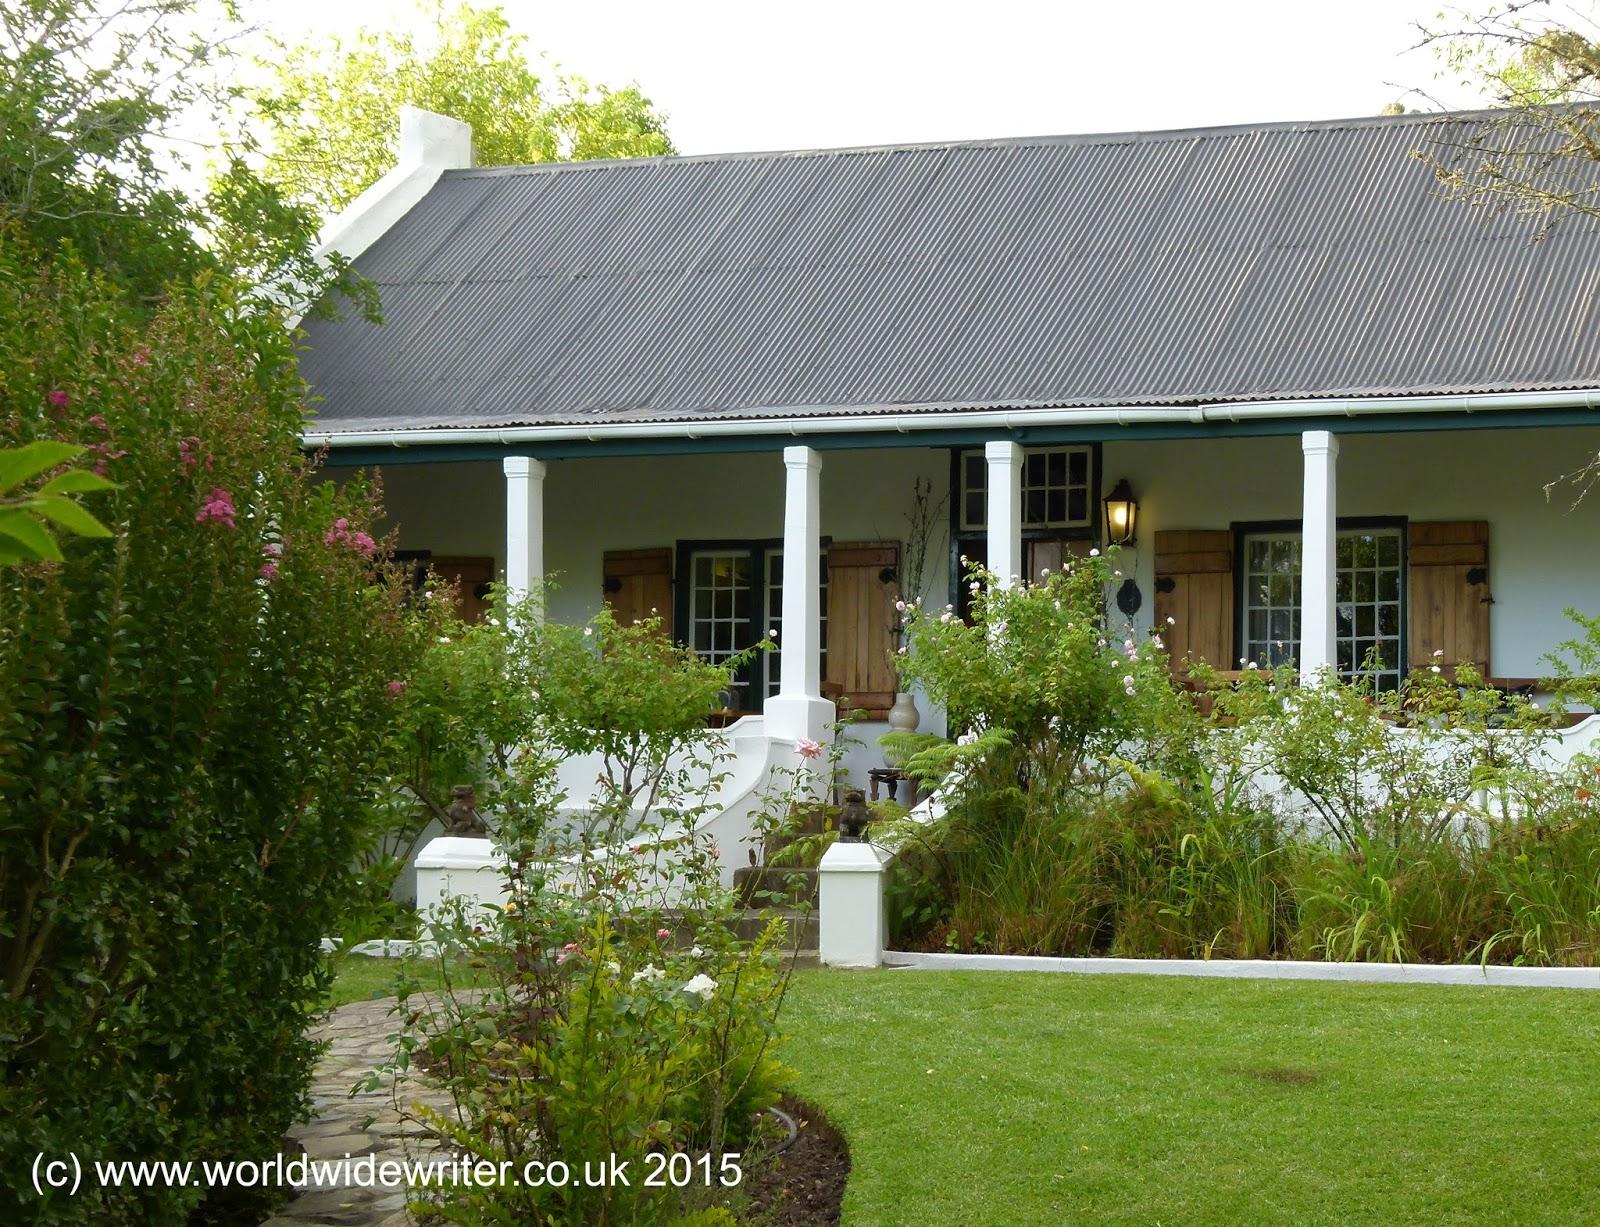 Augusta de Mist Hotel, Swellendam, South Africa